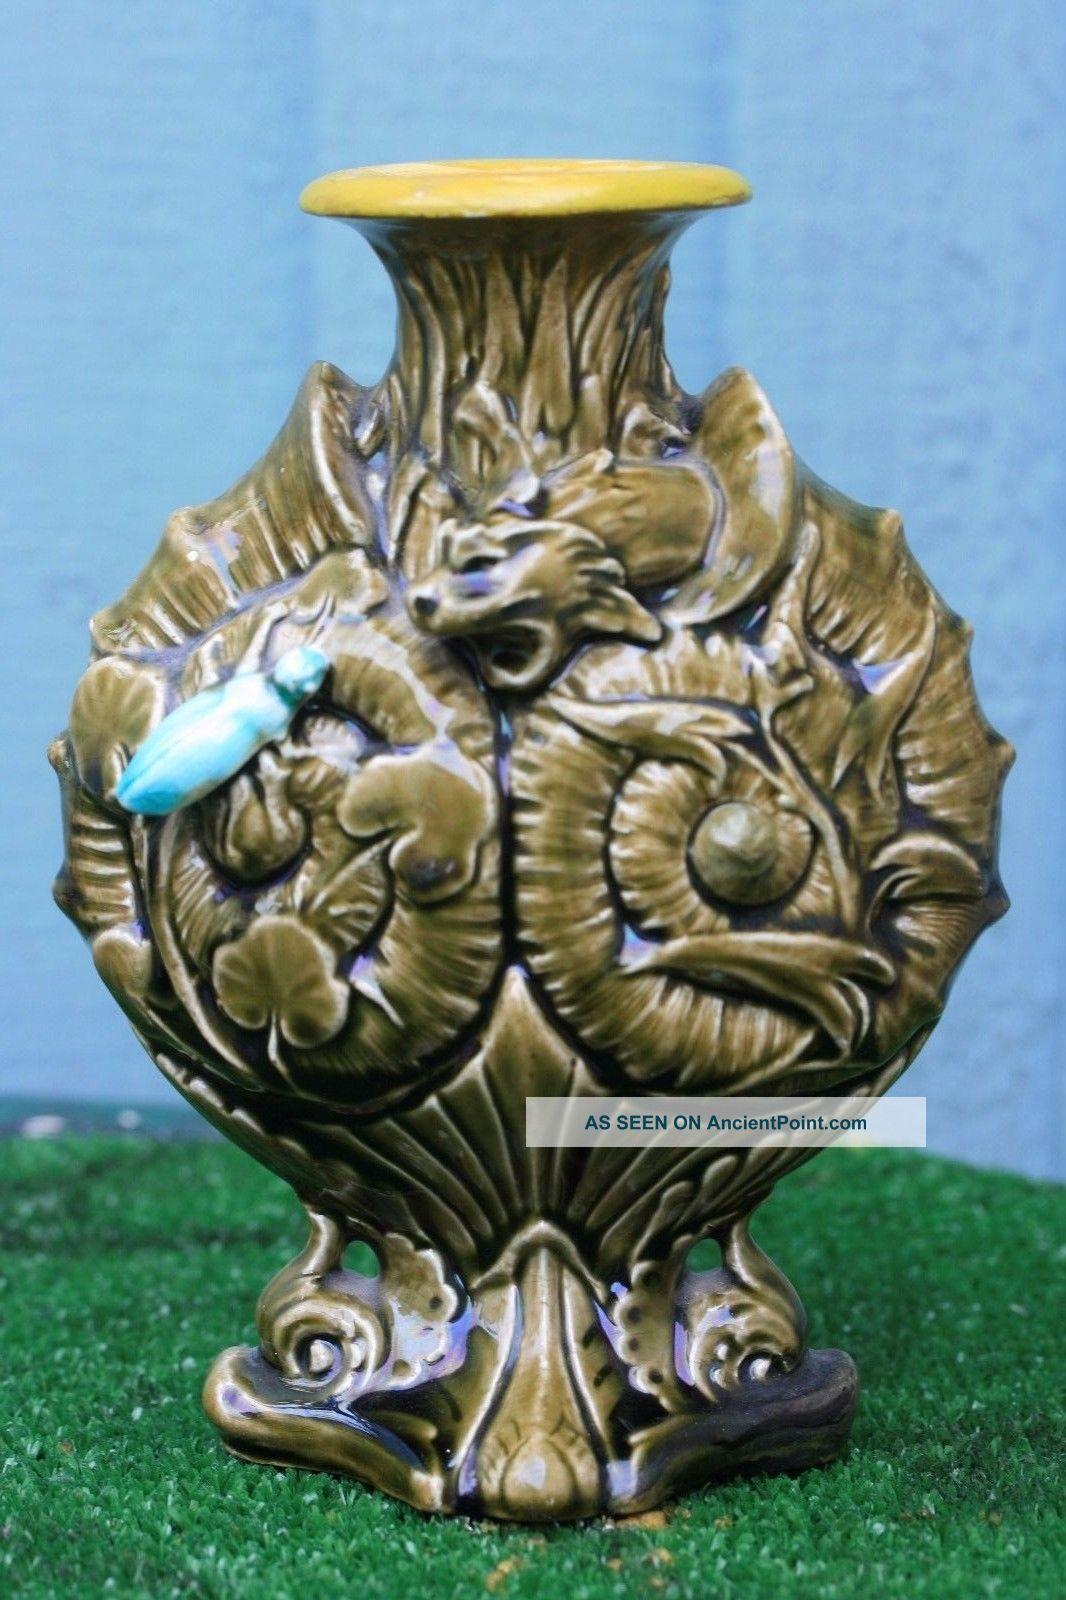 19thc Gothic Majolica Palissy Vase With Gargoyles & Beetle Decor C1880s Figurines photo